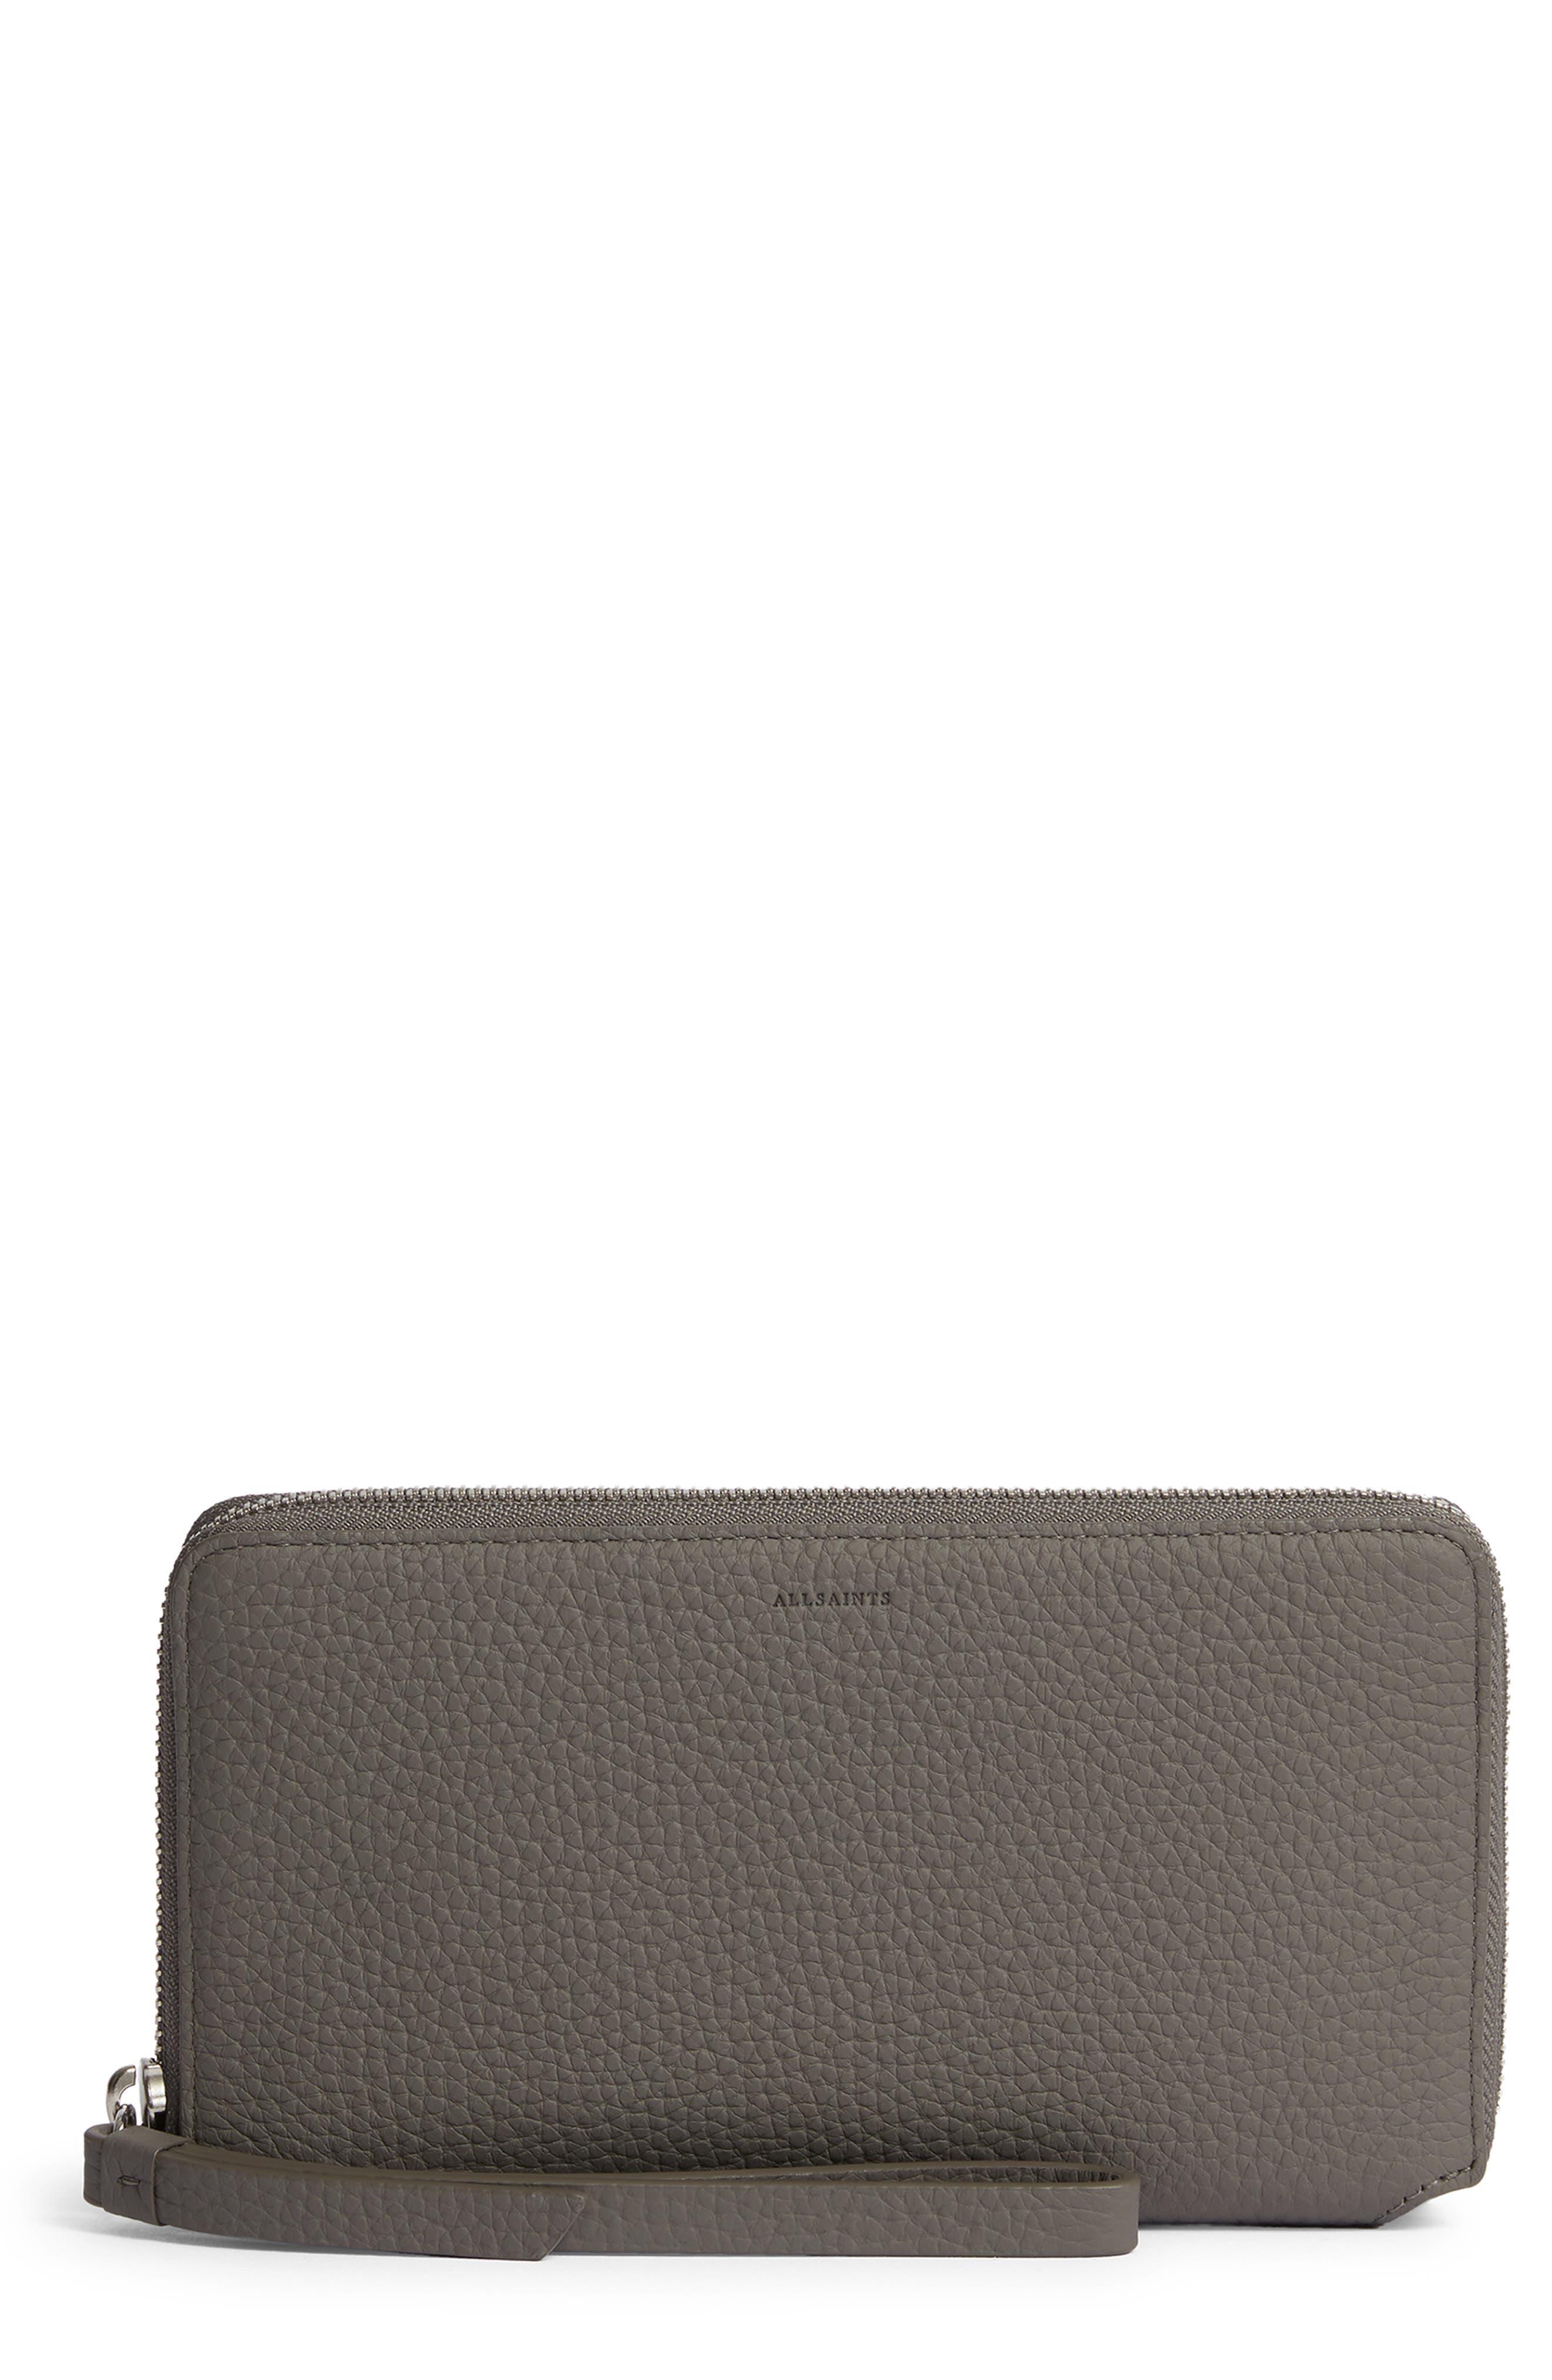 Fetch Leather Phone Wristlet,                         Main,                         color, STORM GREY